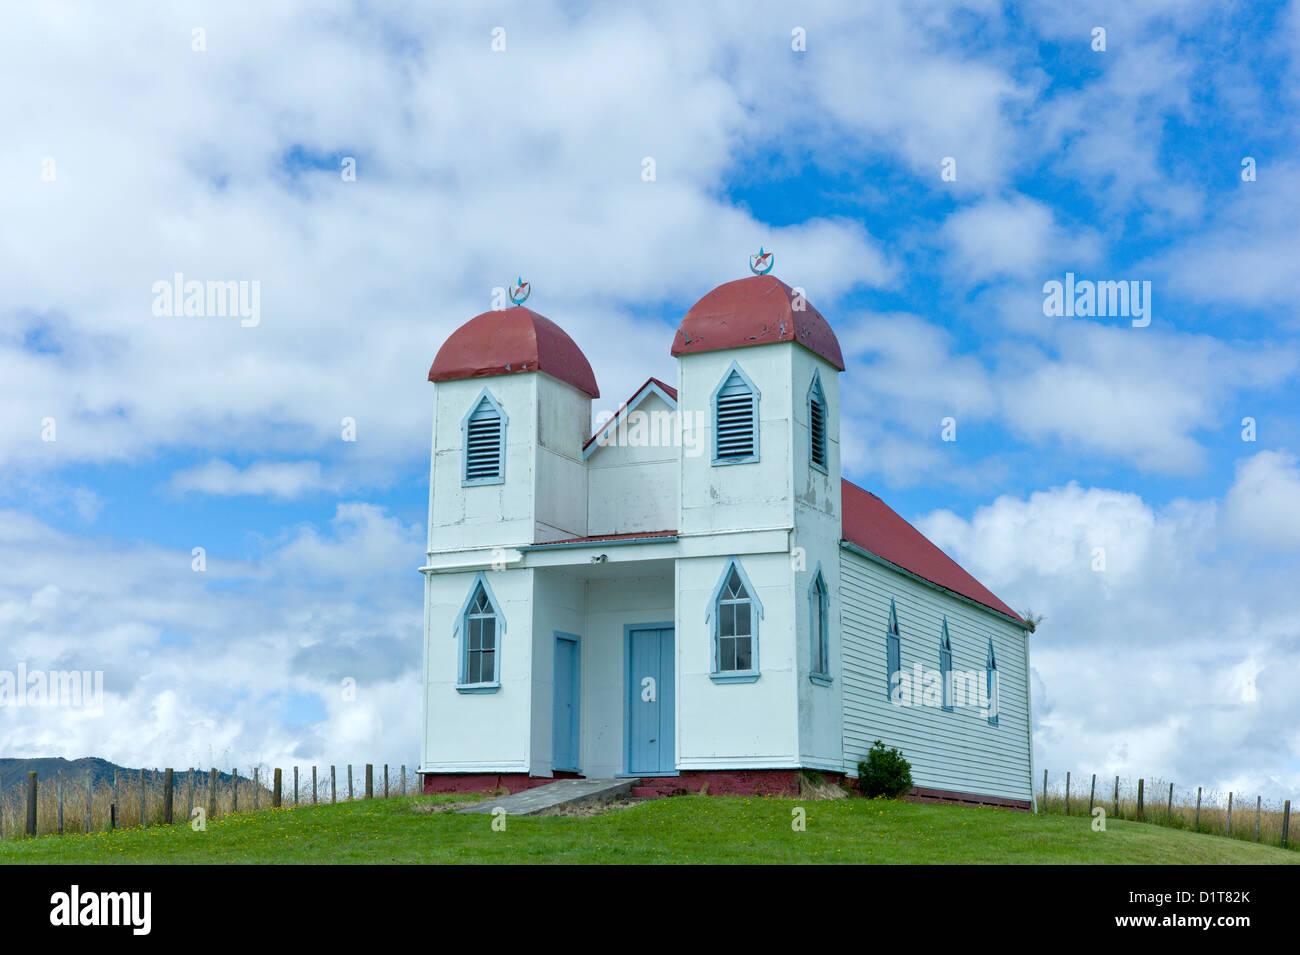 Ratana church, Raetihi New Zealand Stock Photo: 52778955 - Alamy